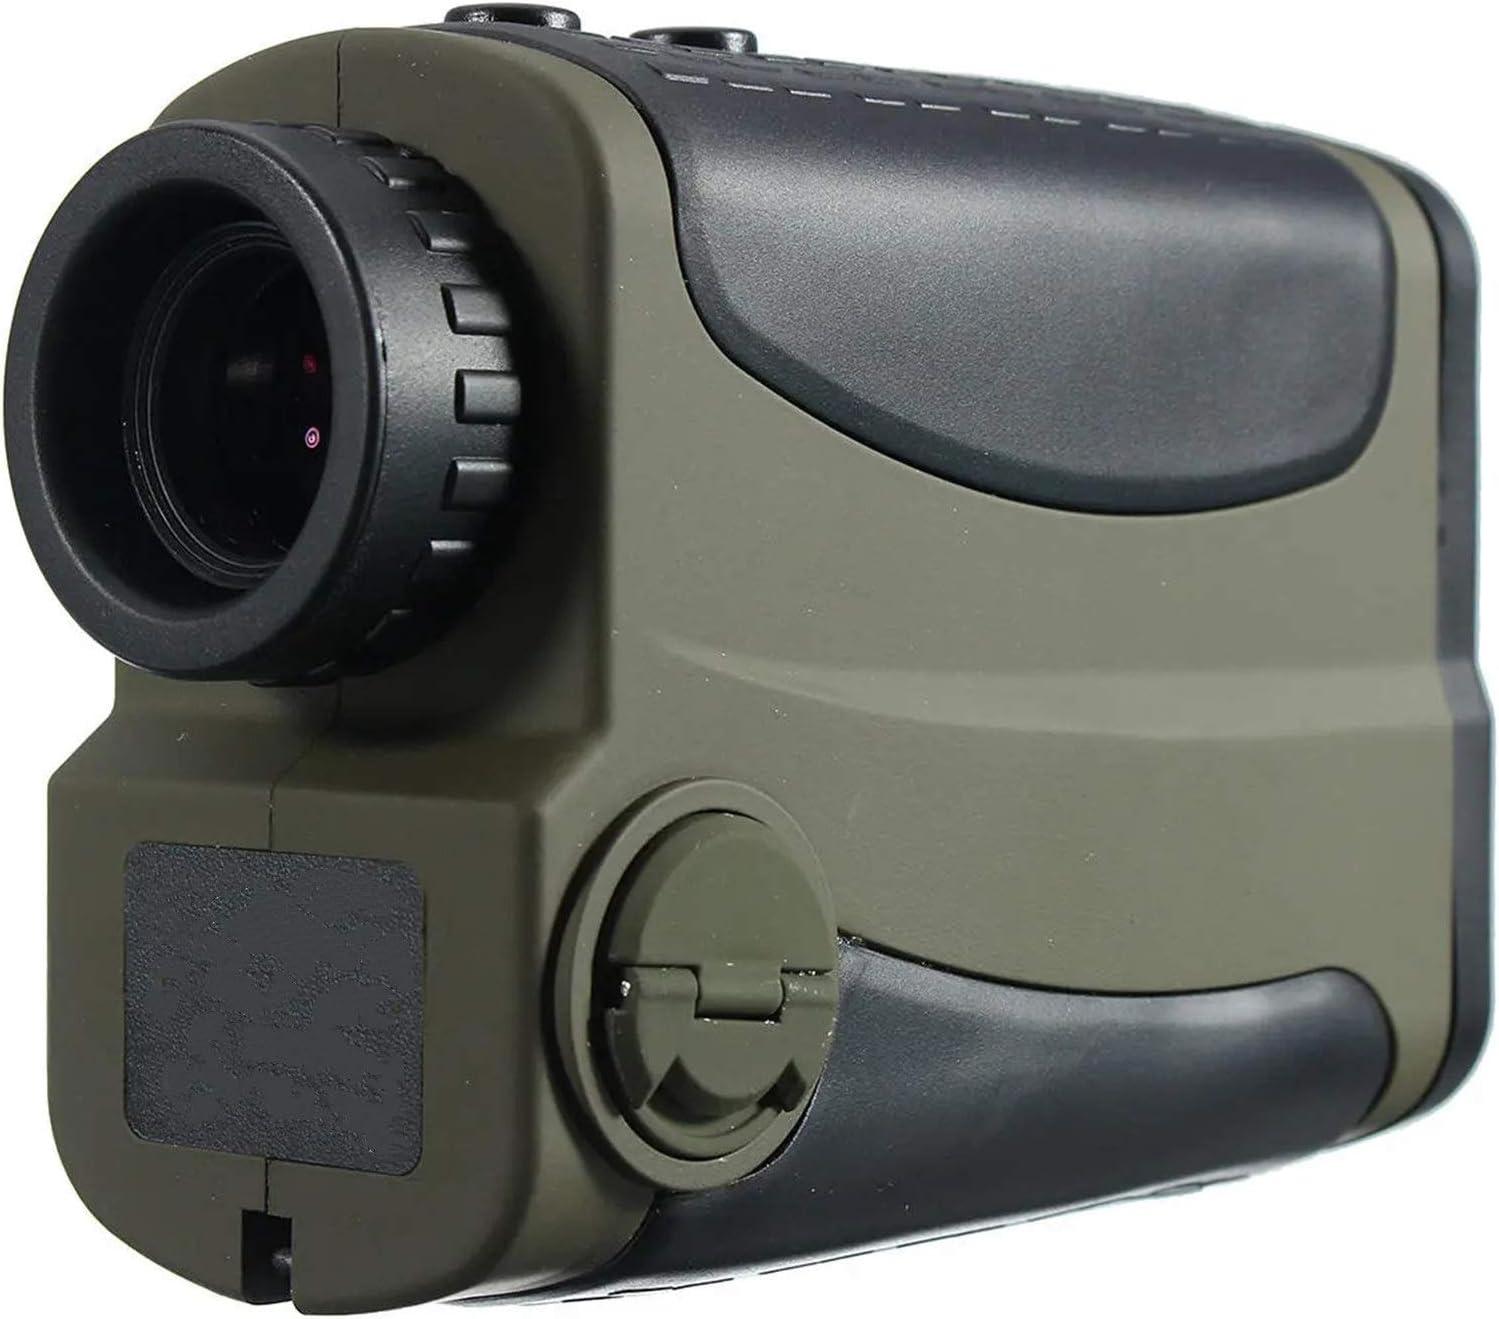 CuteLife Telémetro de Golf Alcance de la Altura de la Altura del ángulo de la Gama de Golf de 700m 6X 6X para la Caza con Arco (Color : Verde, Size : One Size)